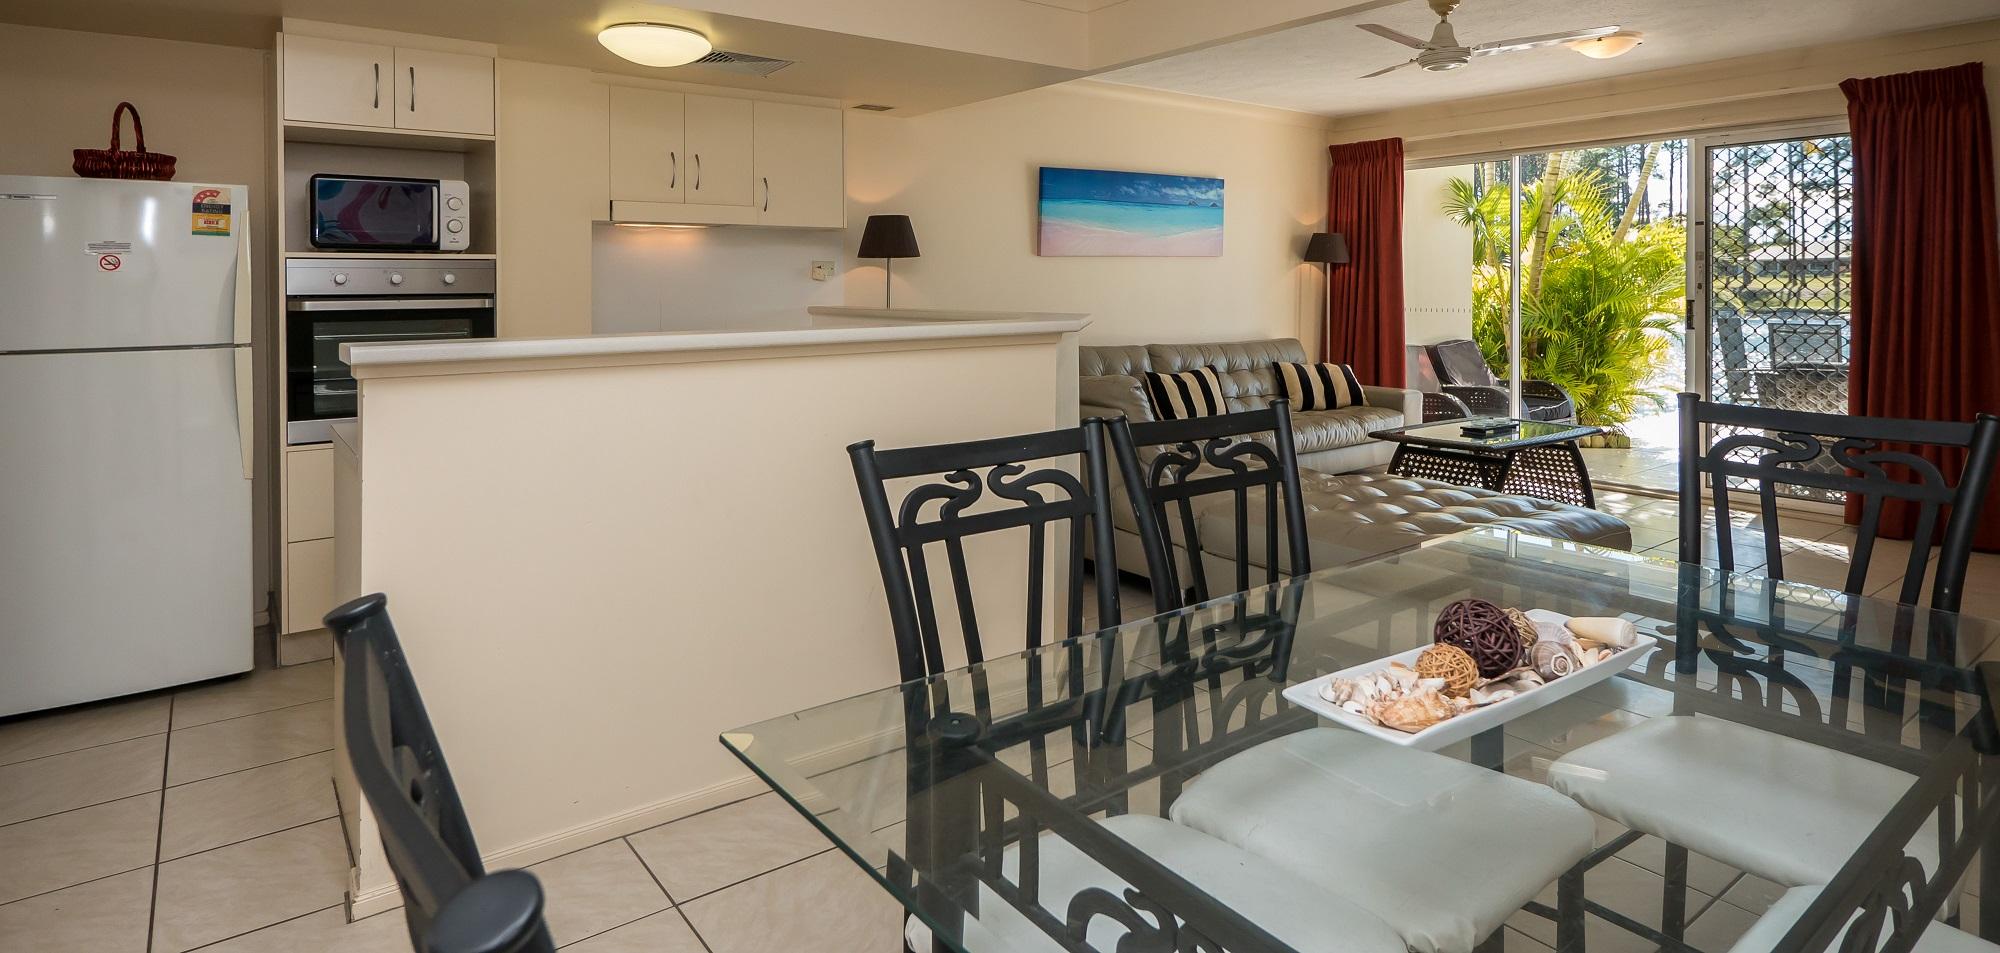 Isle of Palms Resort Accommodation - Dining